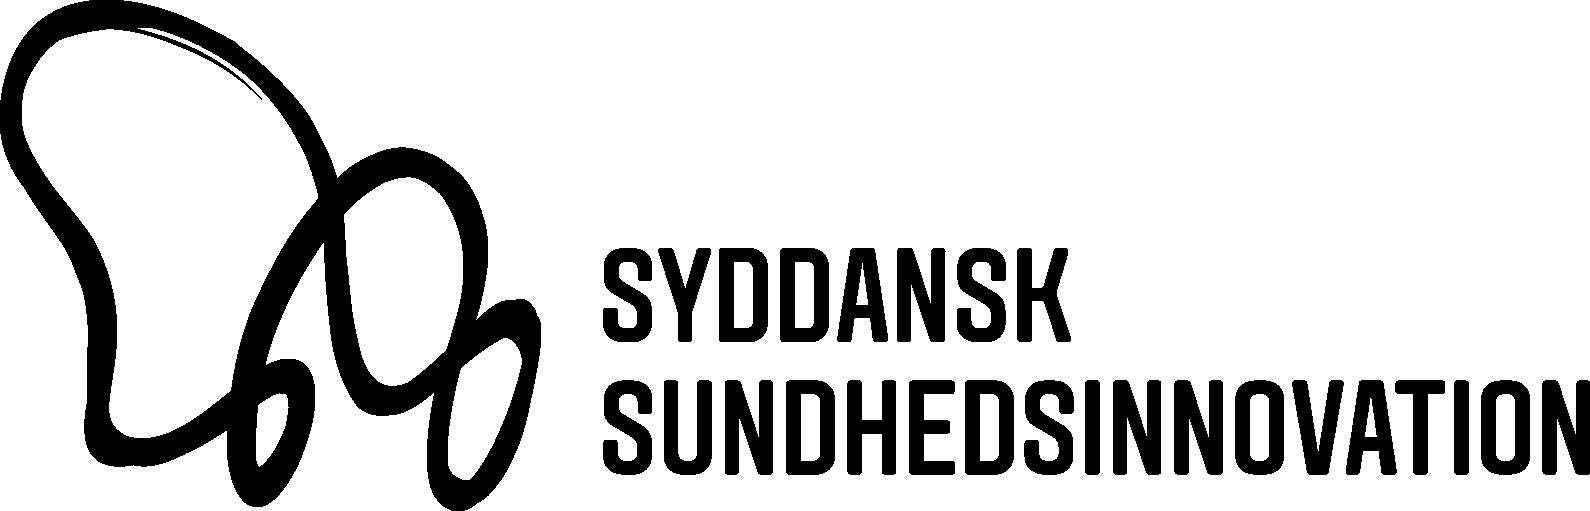 Syddansk sundhedsinnovation logo